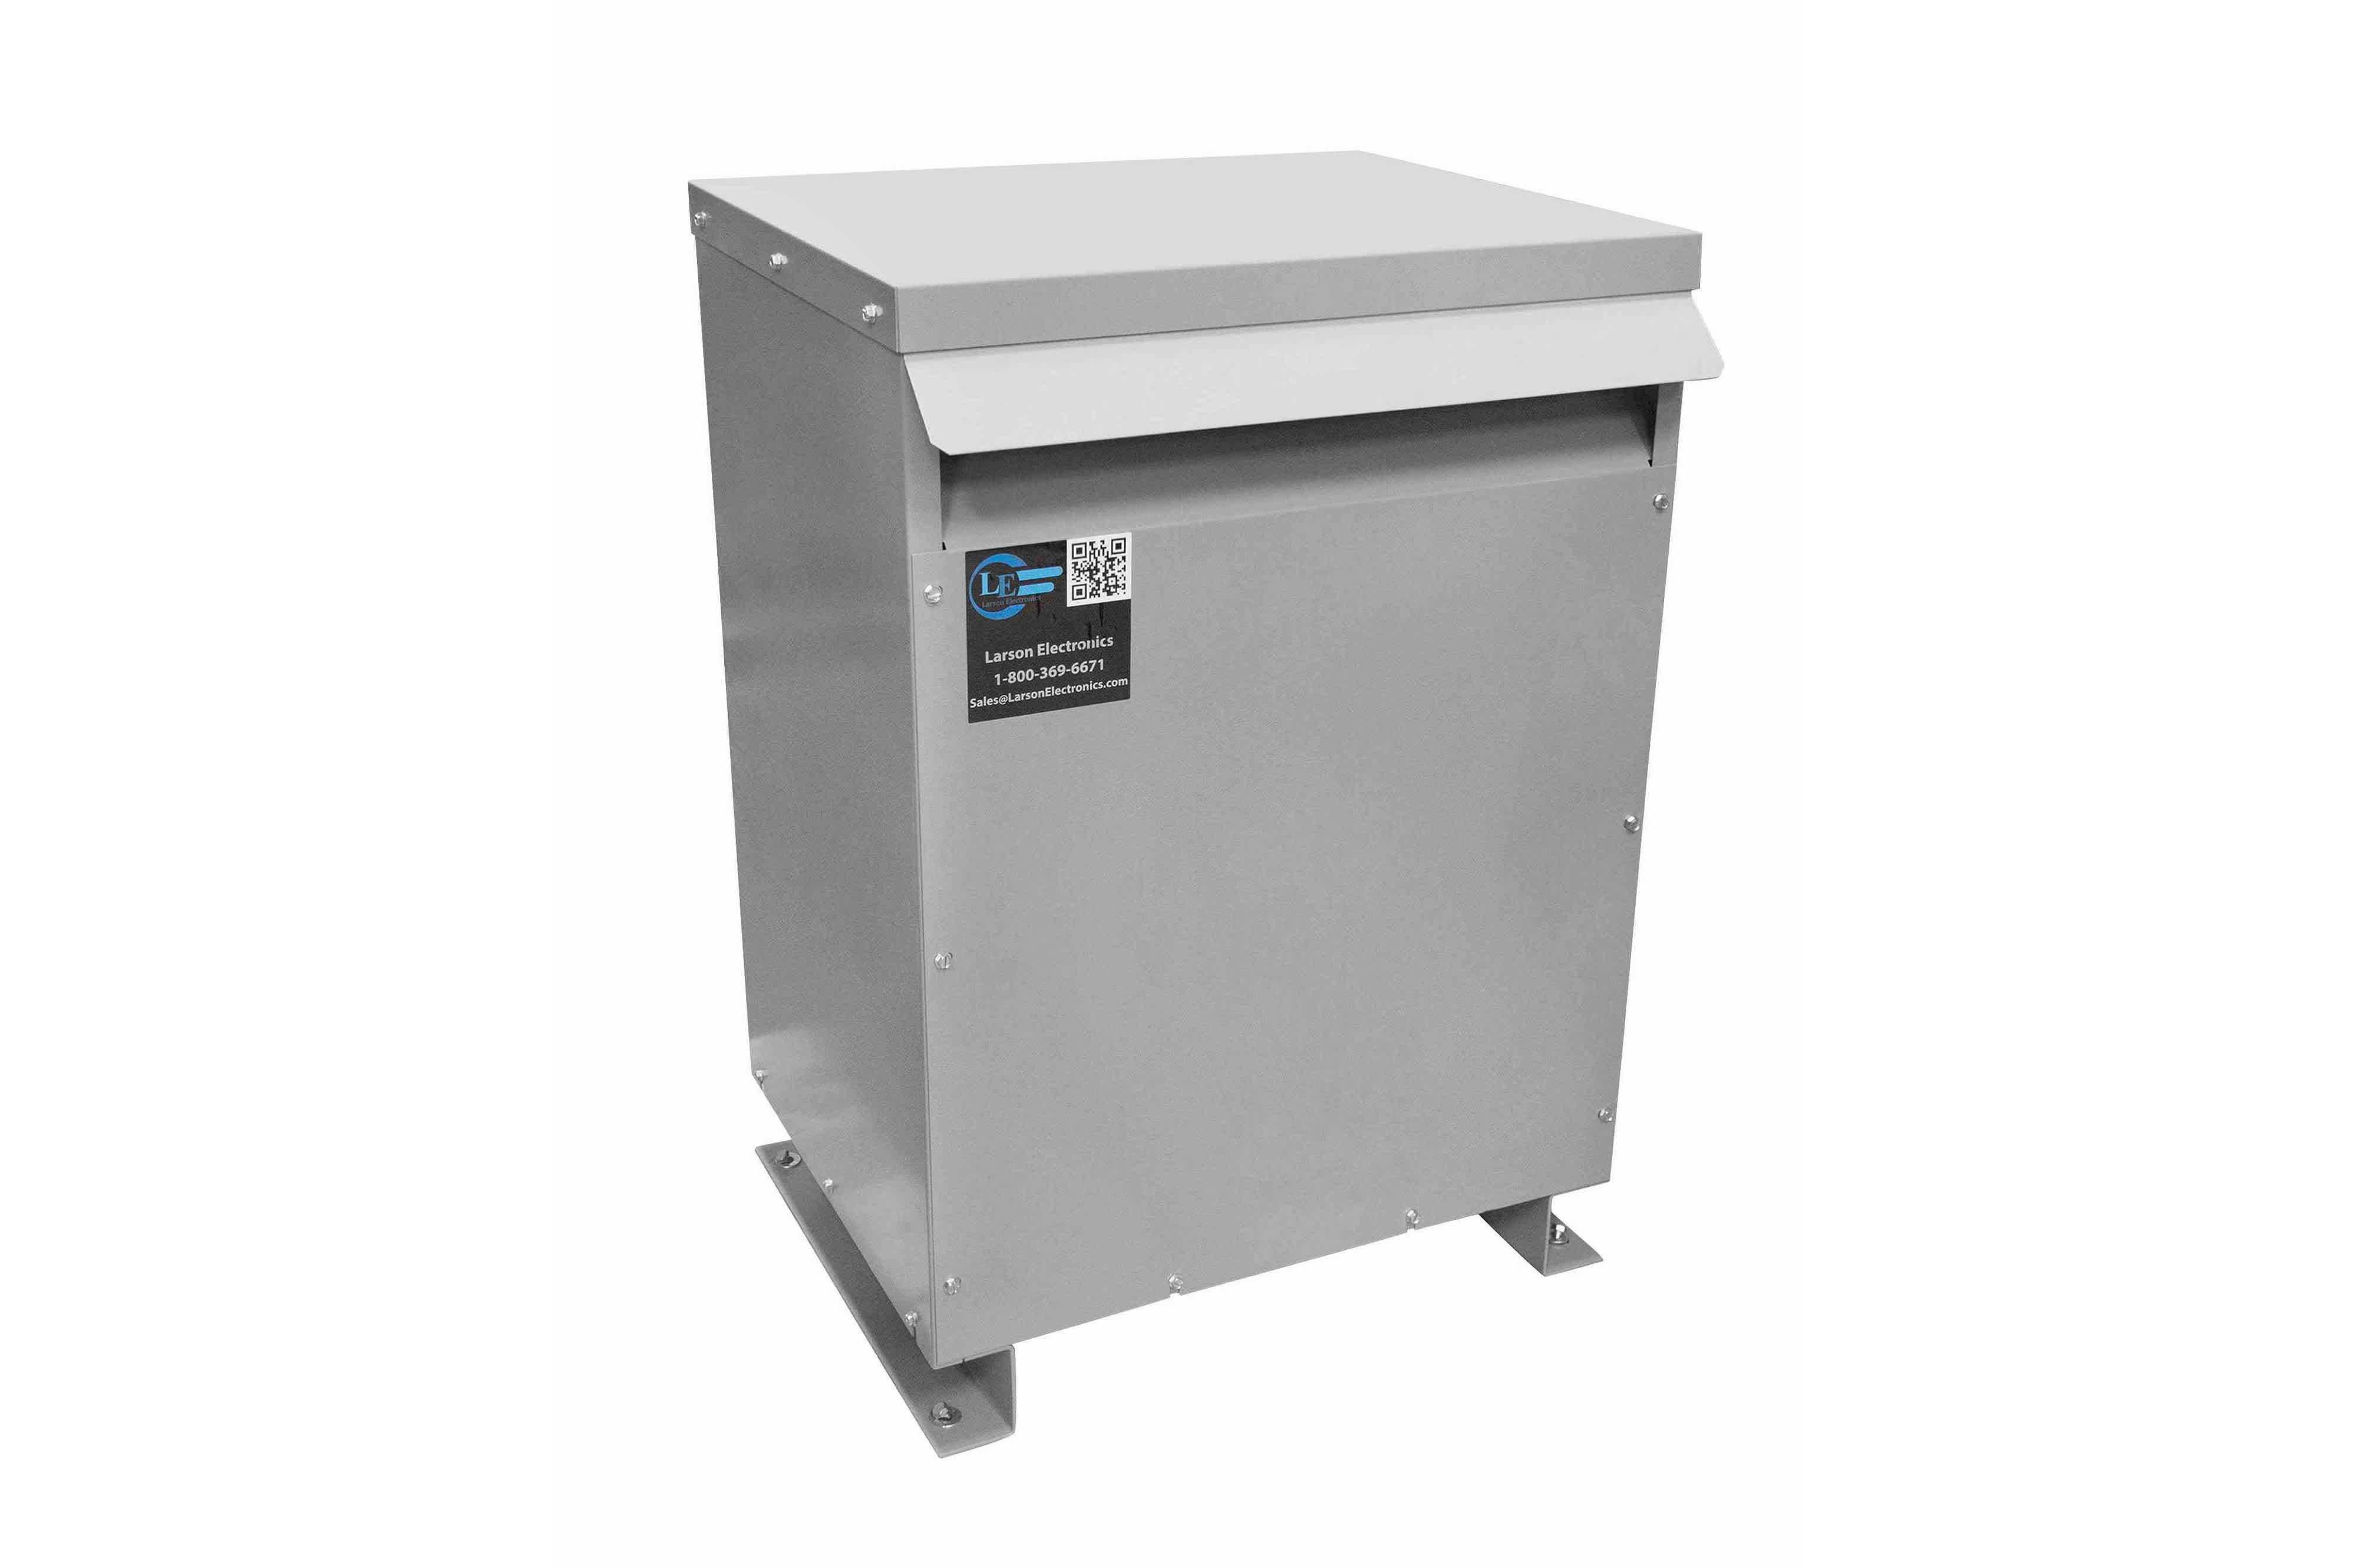 14 kVA 3PH Isolation Transformer, 480V Wye Primary, 600V Delta Secondary, N3R, Ventilated, 60 Hz